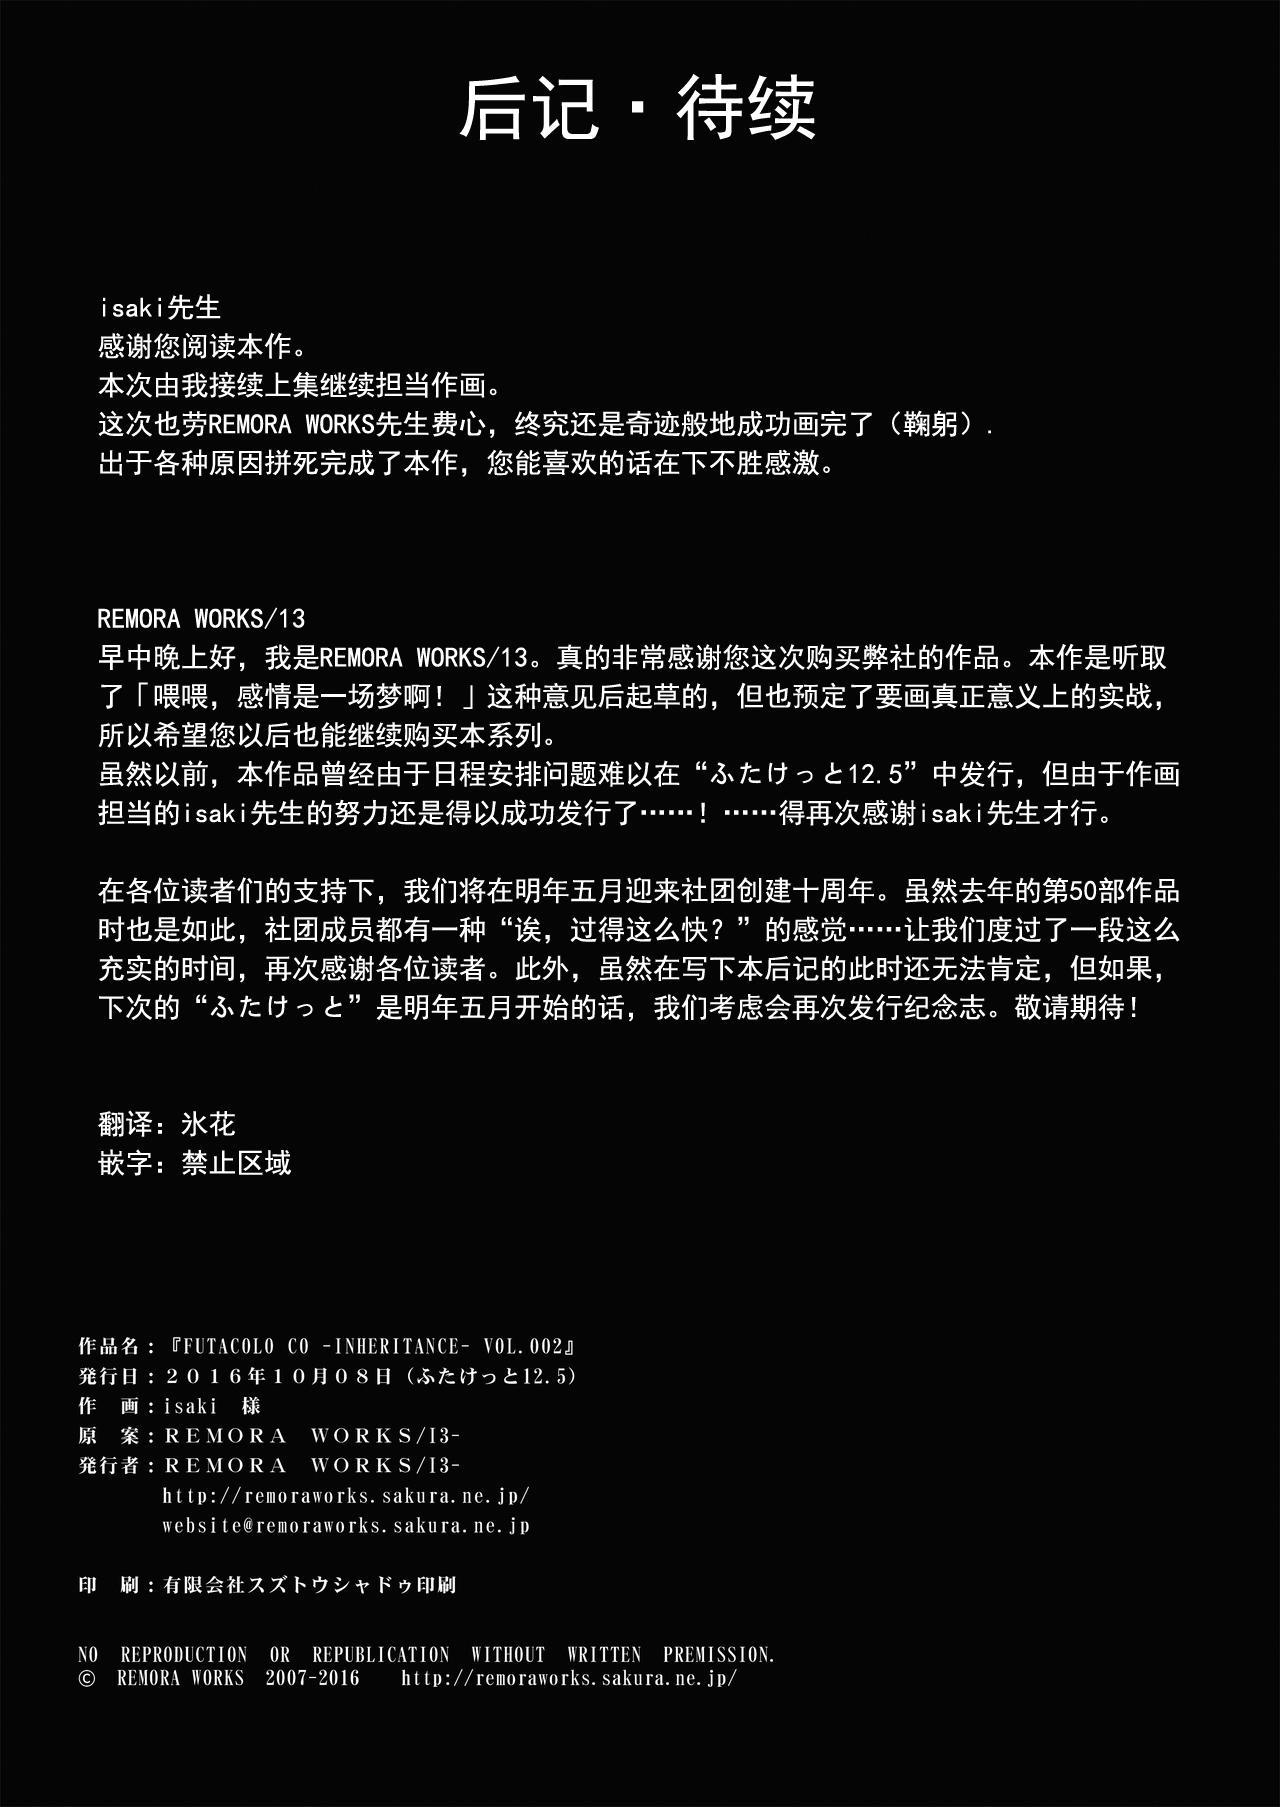 [Remora Works] FUTACOLO CO -INHERITANCE- VOL.002 [Chinese] [无毒汉化组] 22